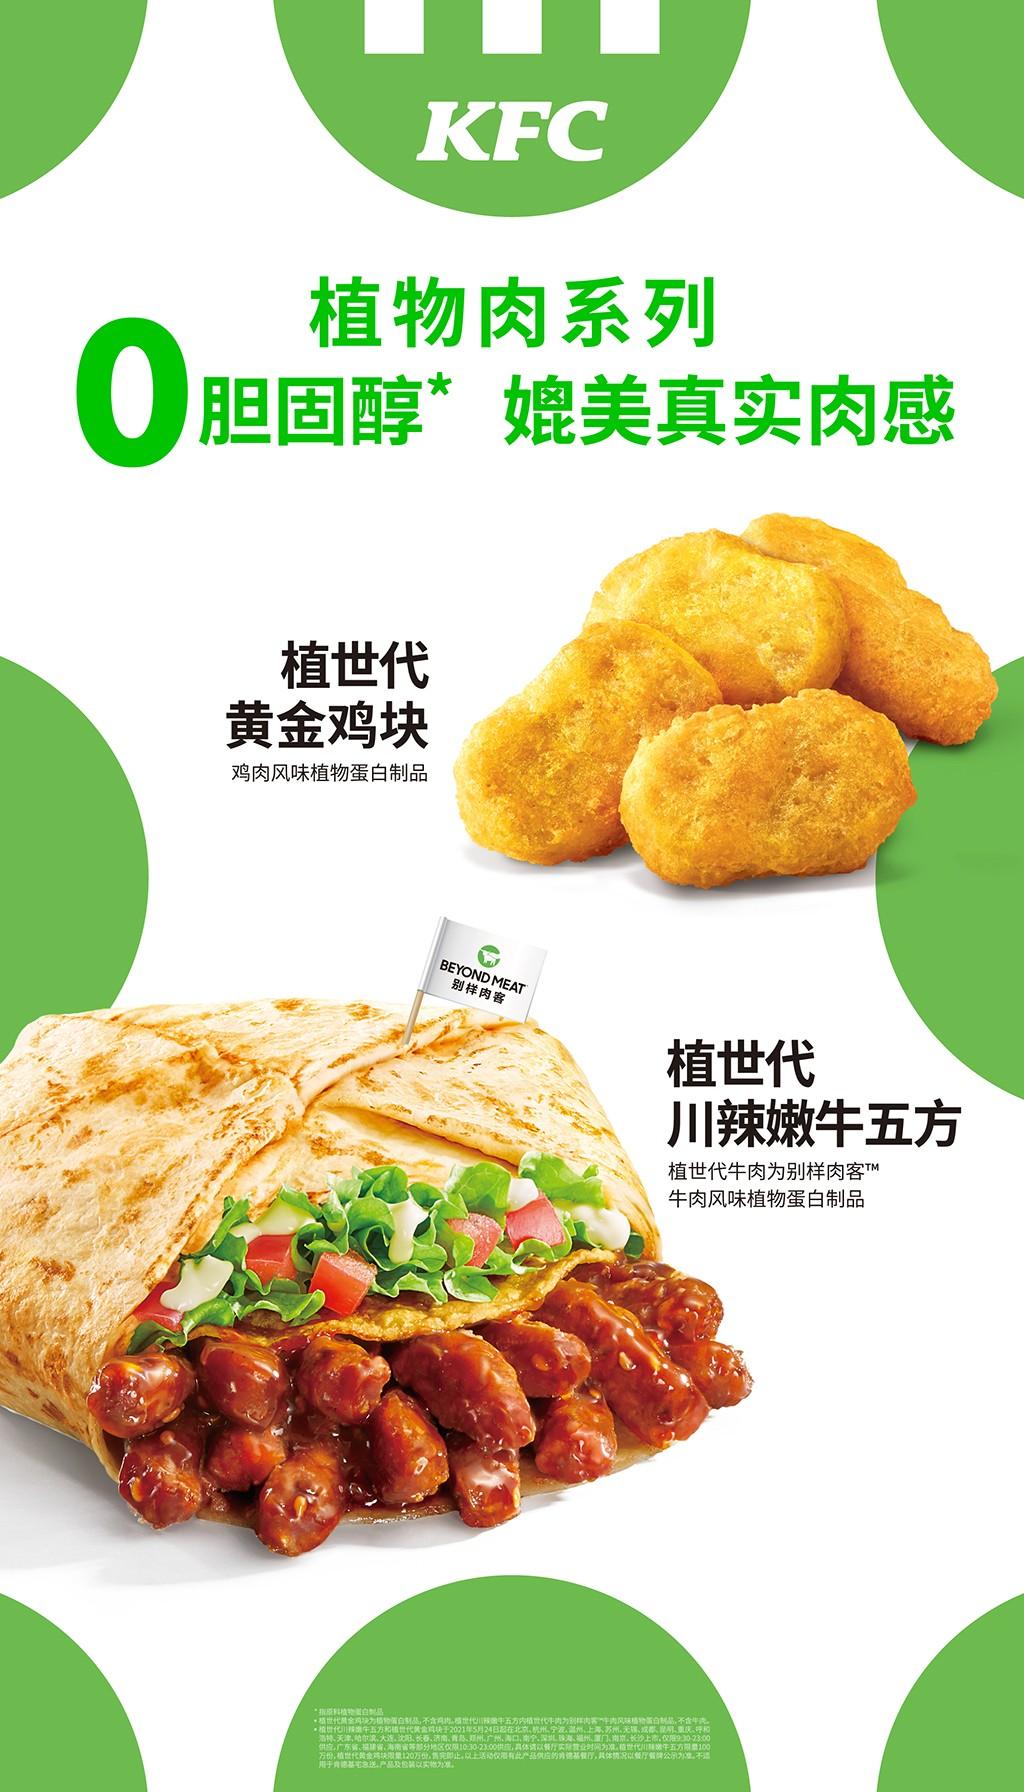 "KFC""植物魔法""再更新:多维度深入可持续饮食布局 植物肉之后再推植物饮"